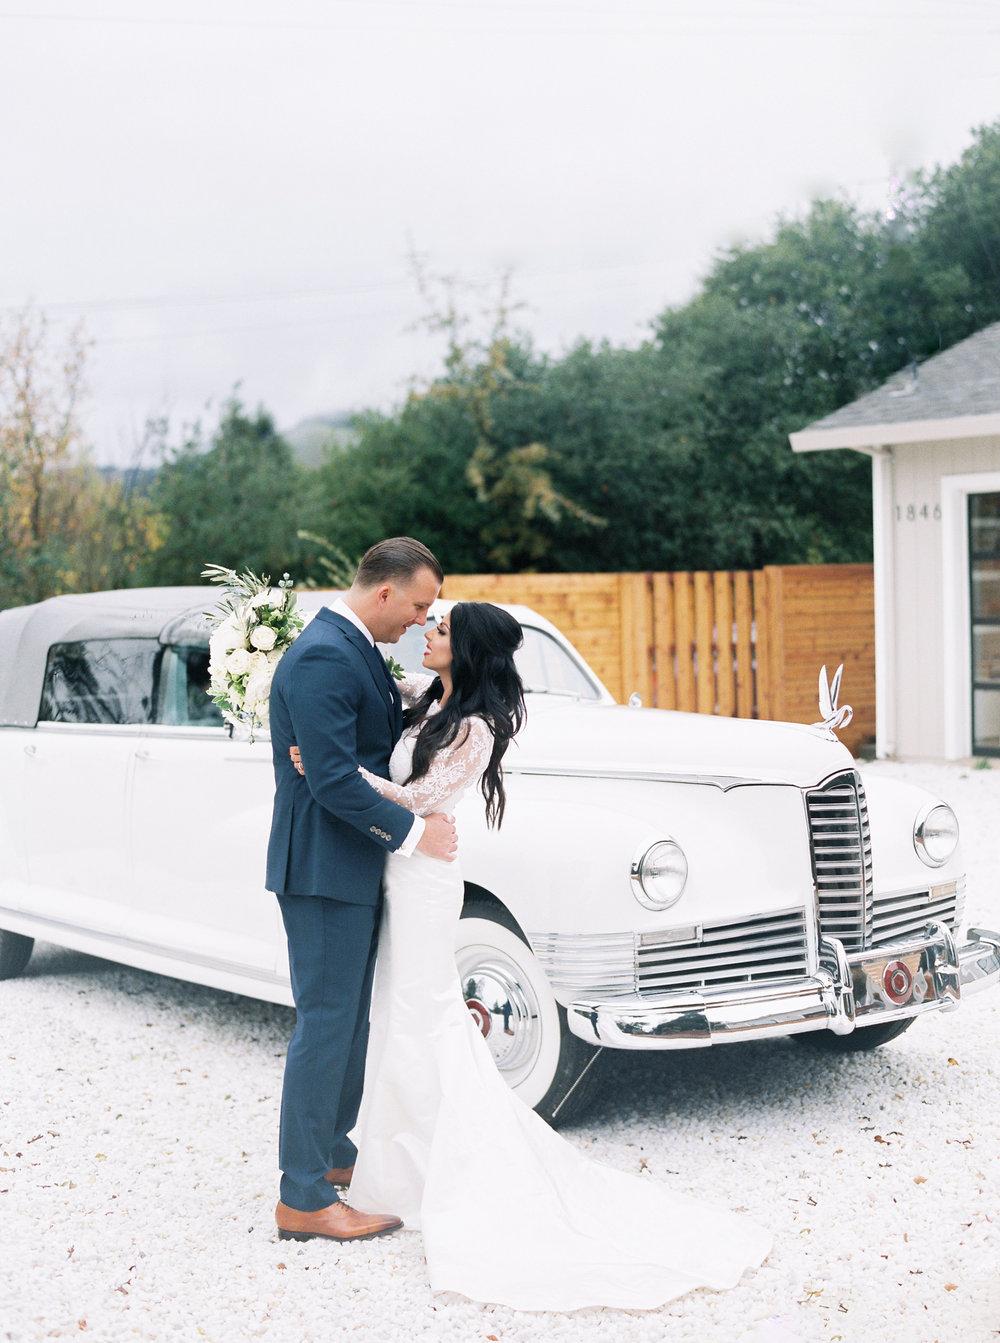 romantic-wedding-at-cline-winery-in-sonoma-california-22.jpg